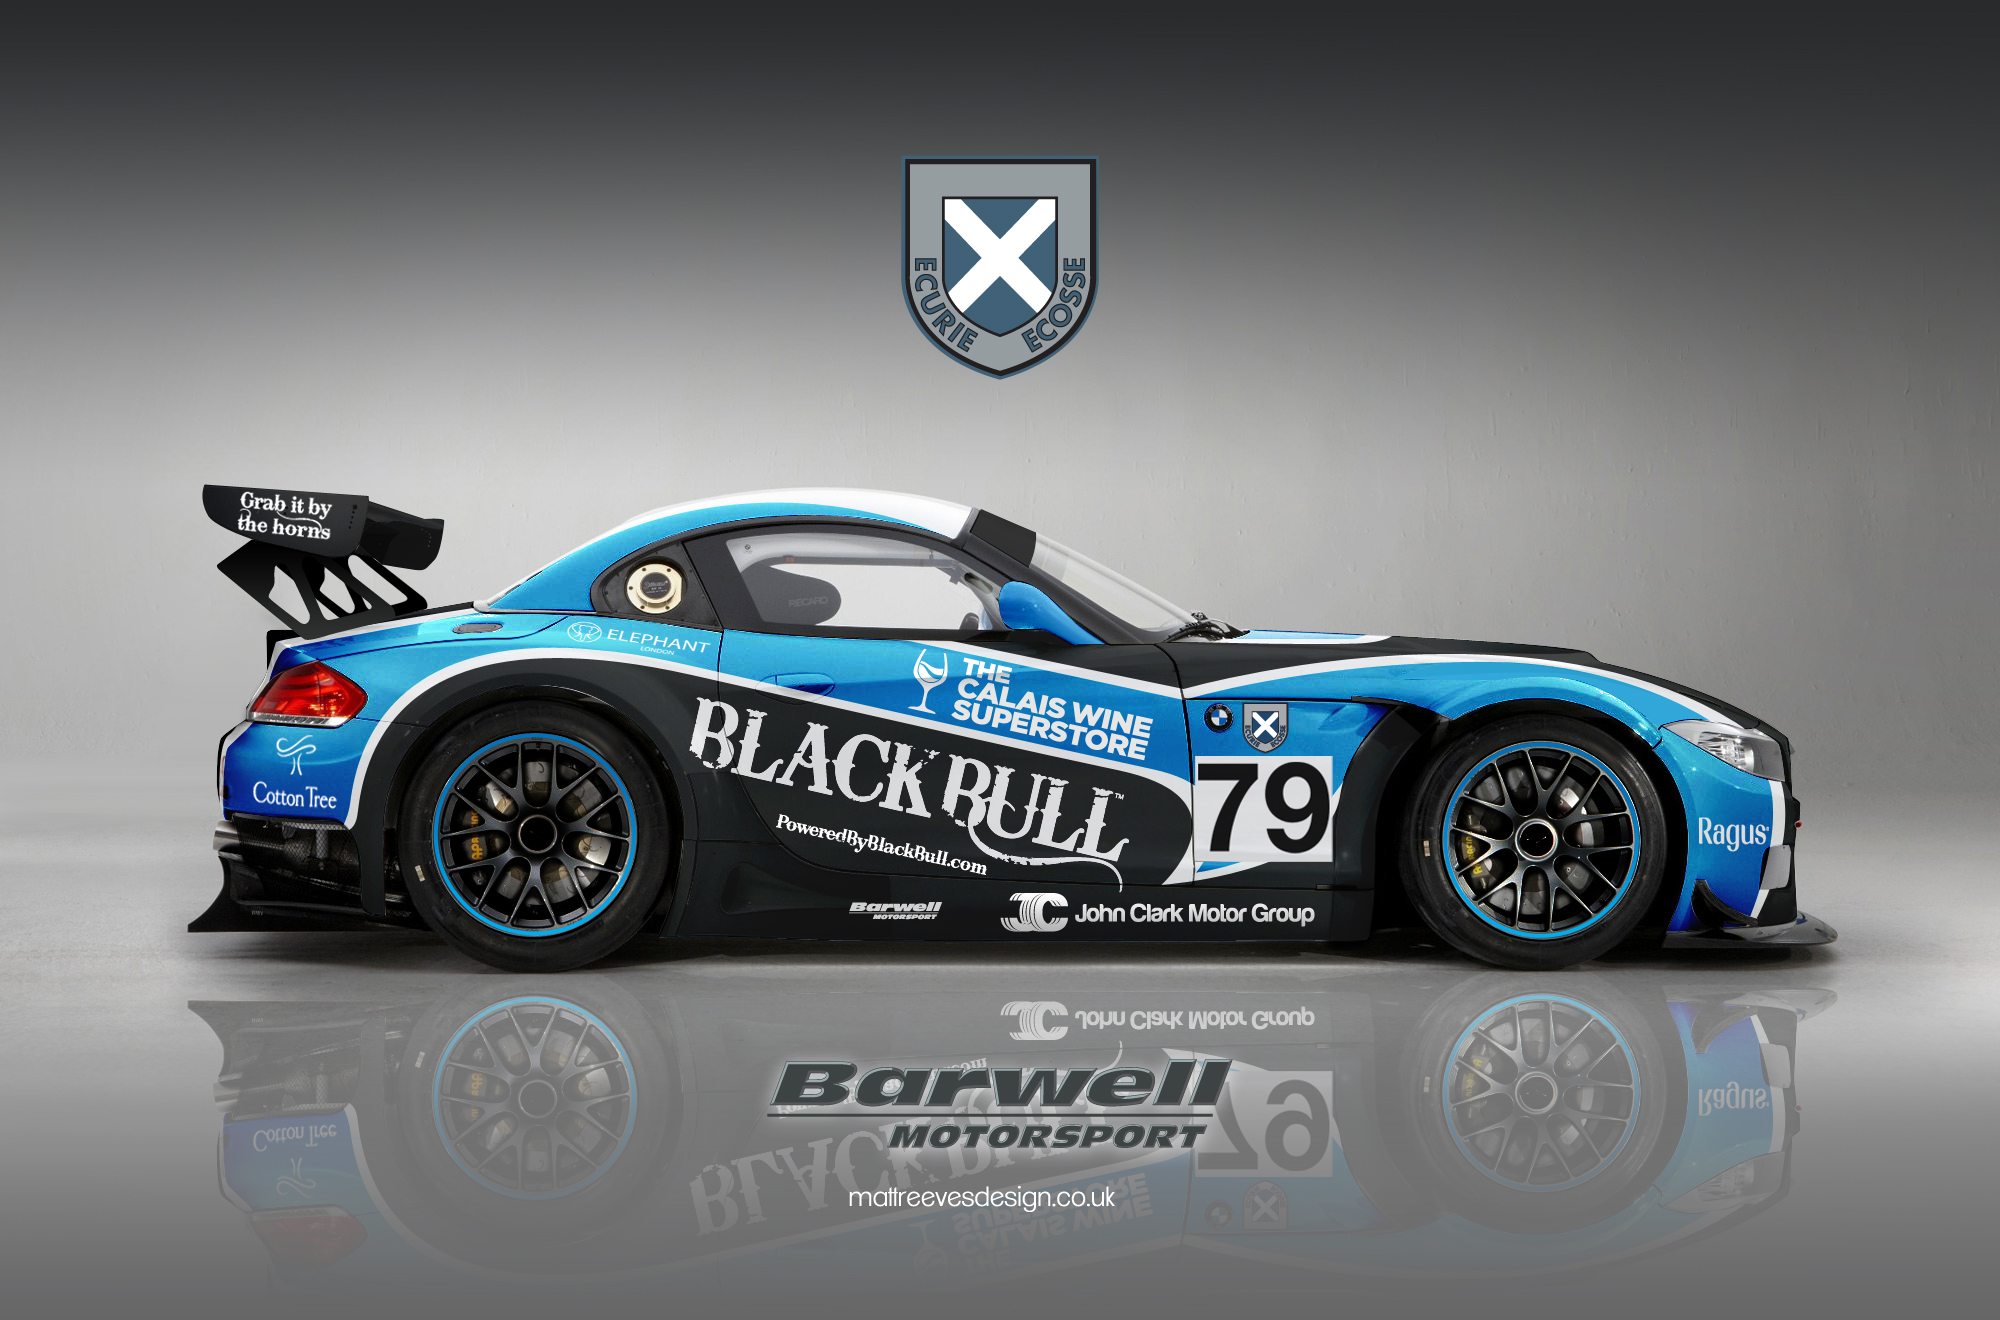 Barwell Motorsport Ecurie Ecosse Guns For British Gt